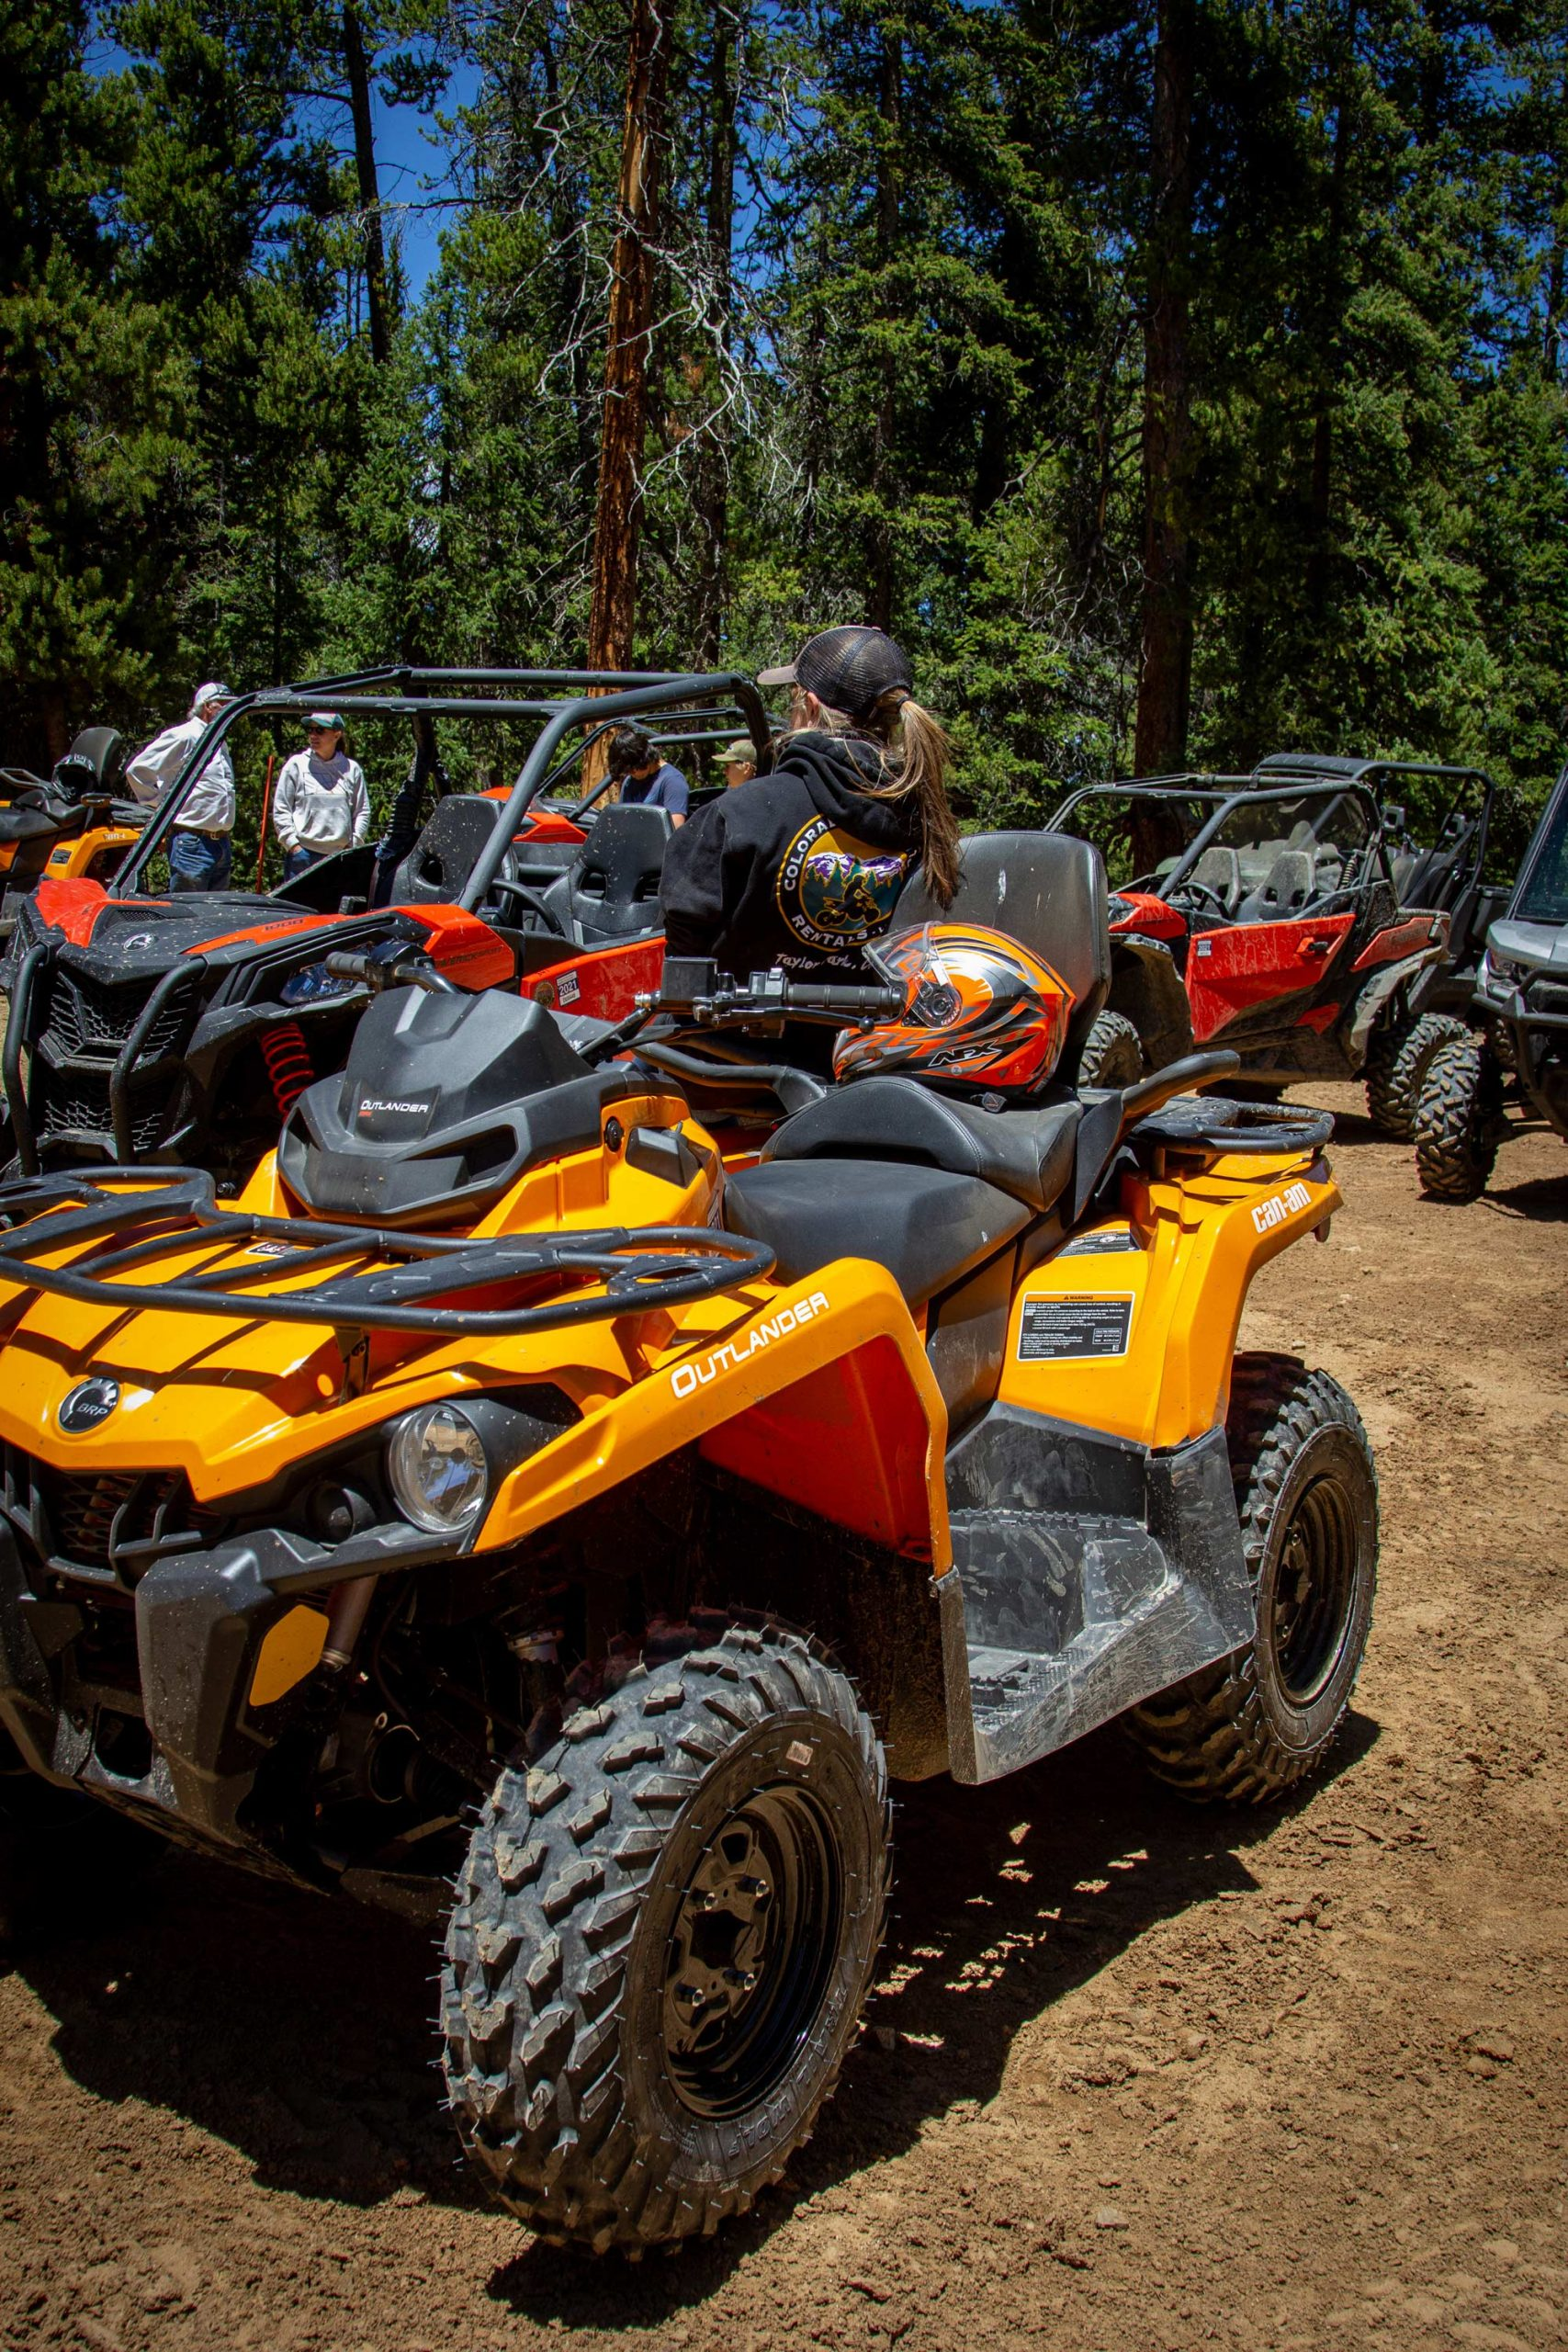 Colorado Adventure Rentals Snowmobile Atv Rentals Crested Butte